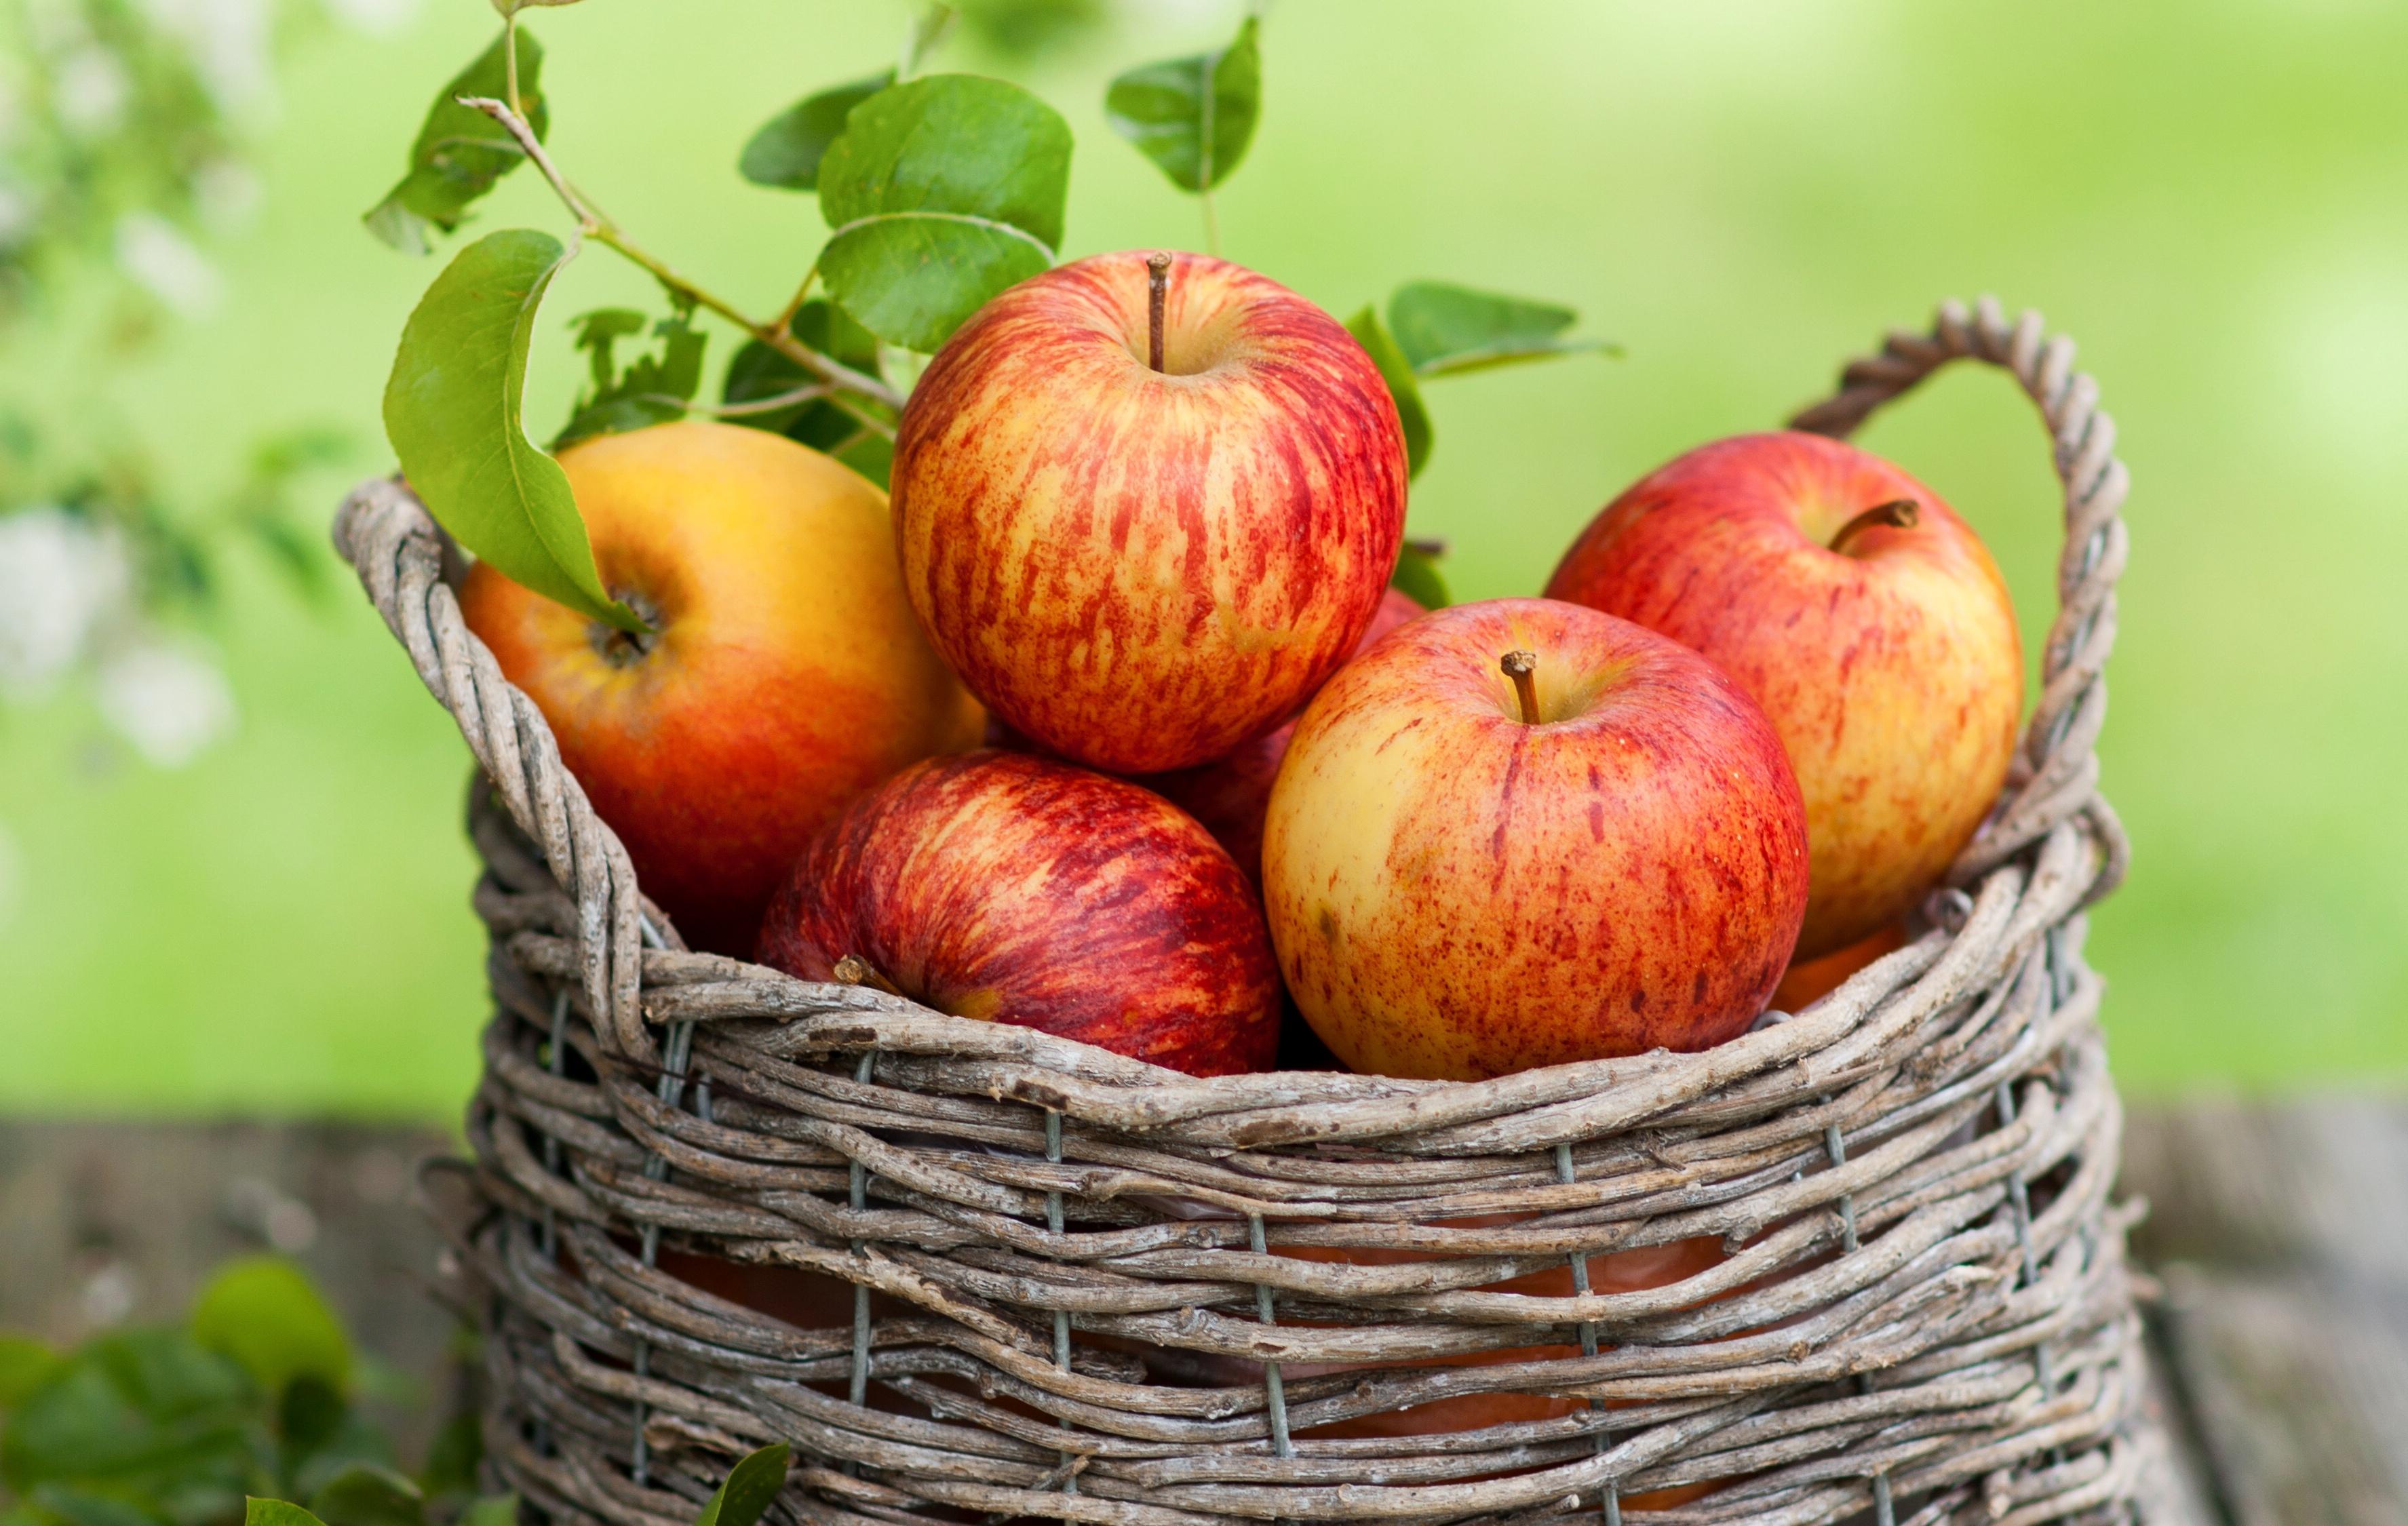 яблоки  № 164374 бесплатно